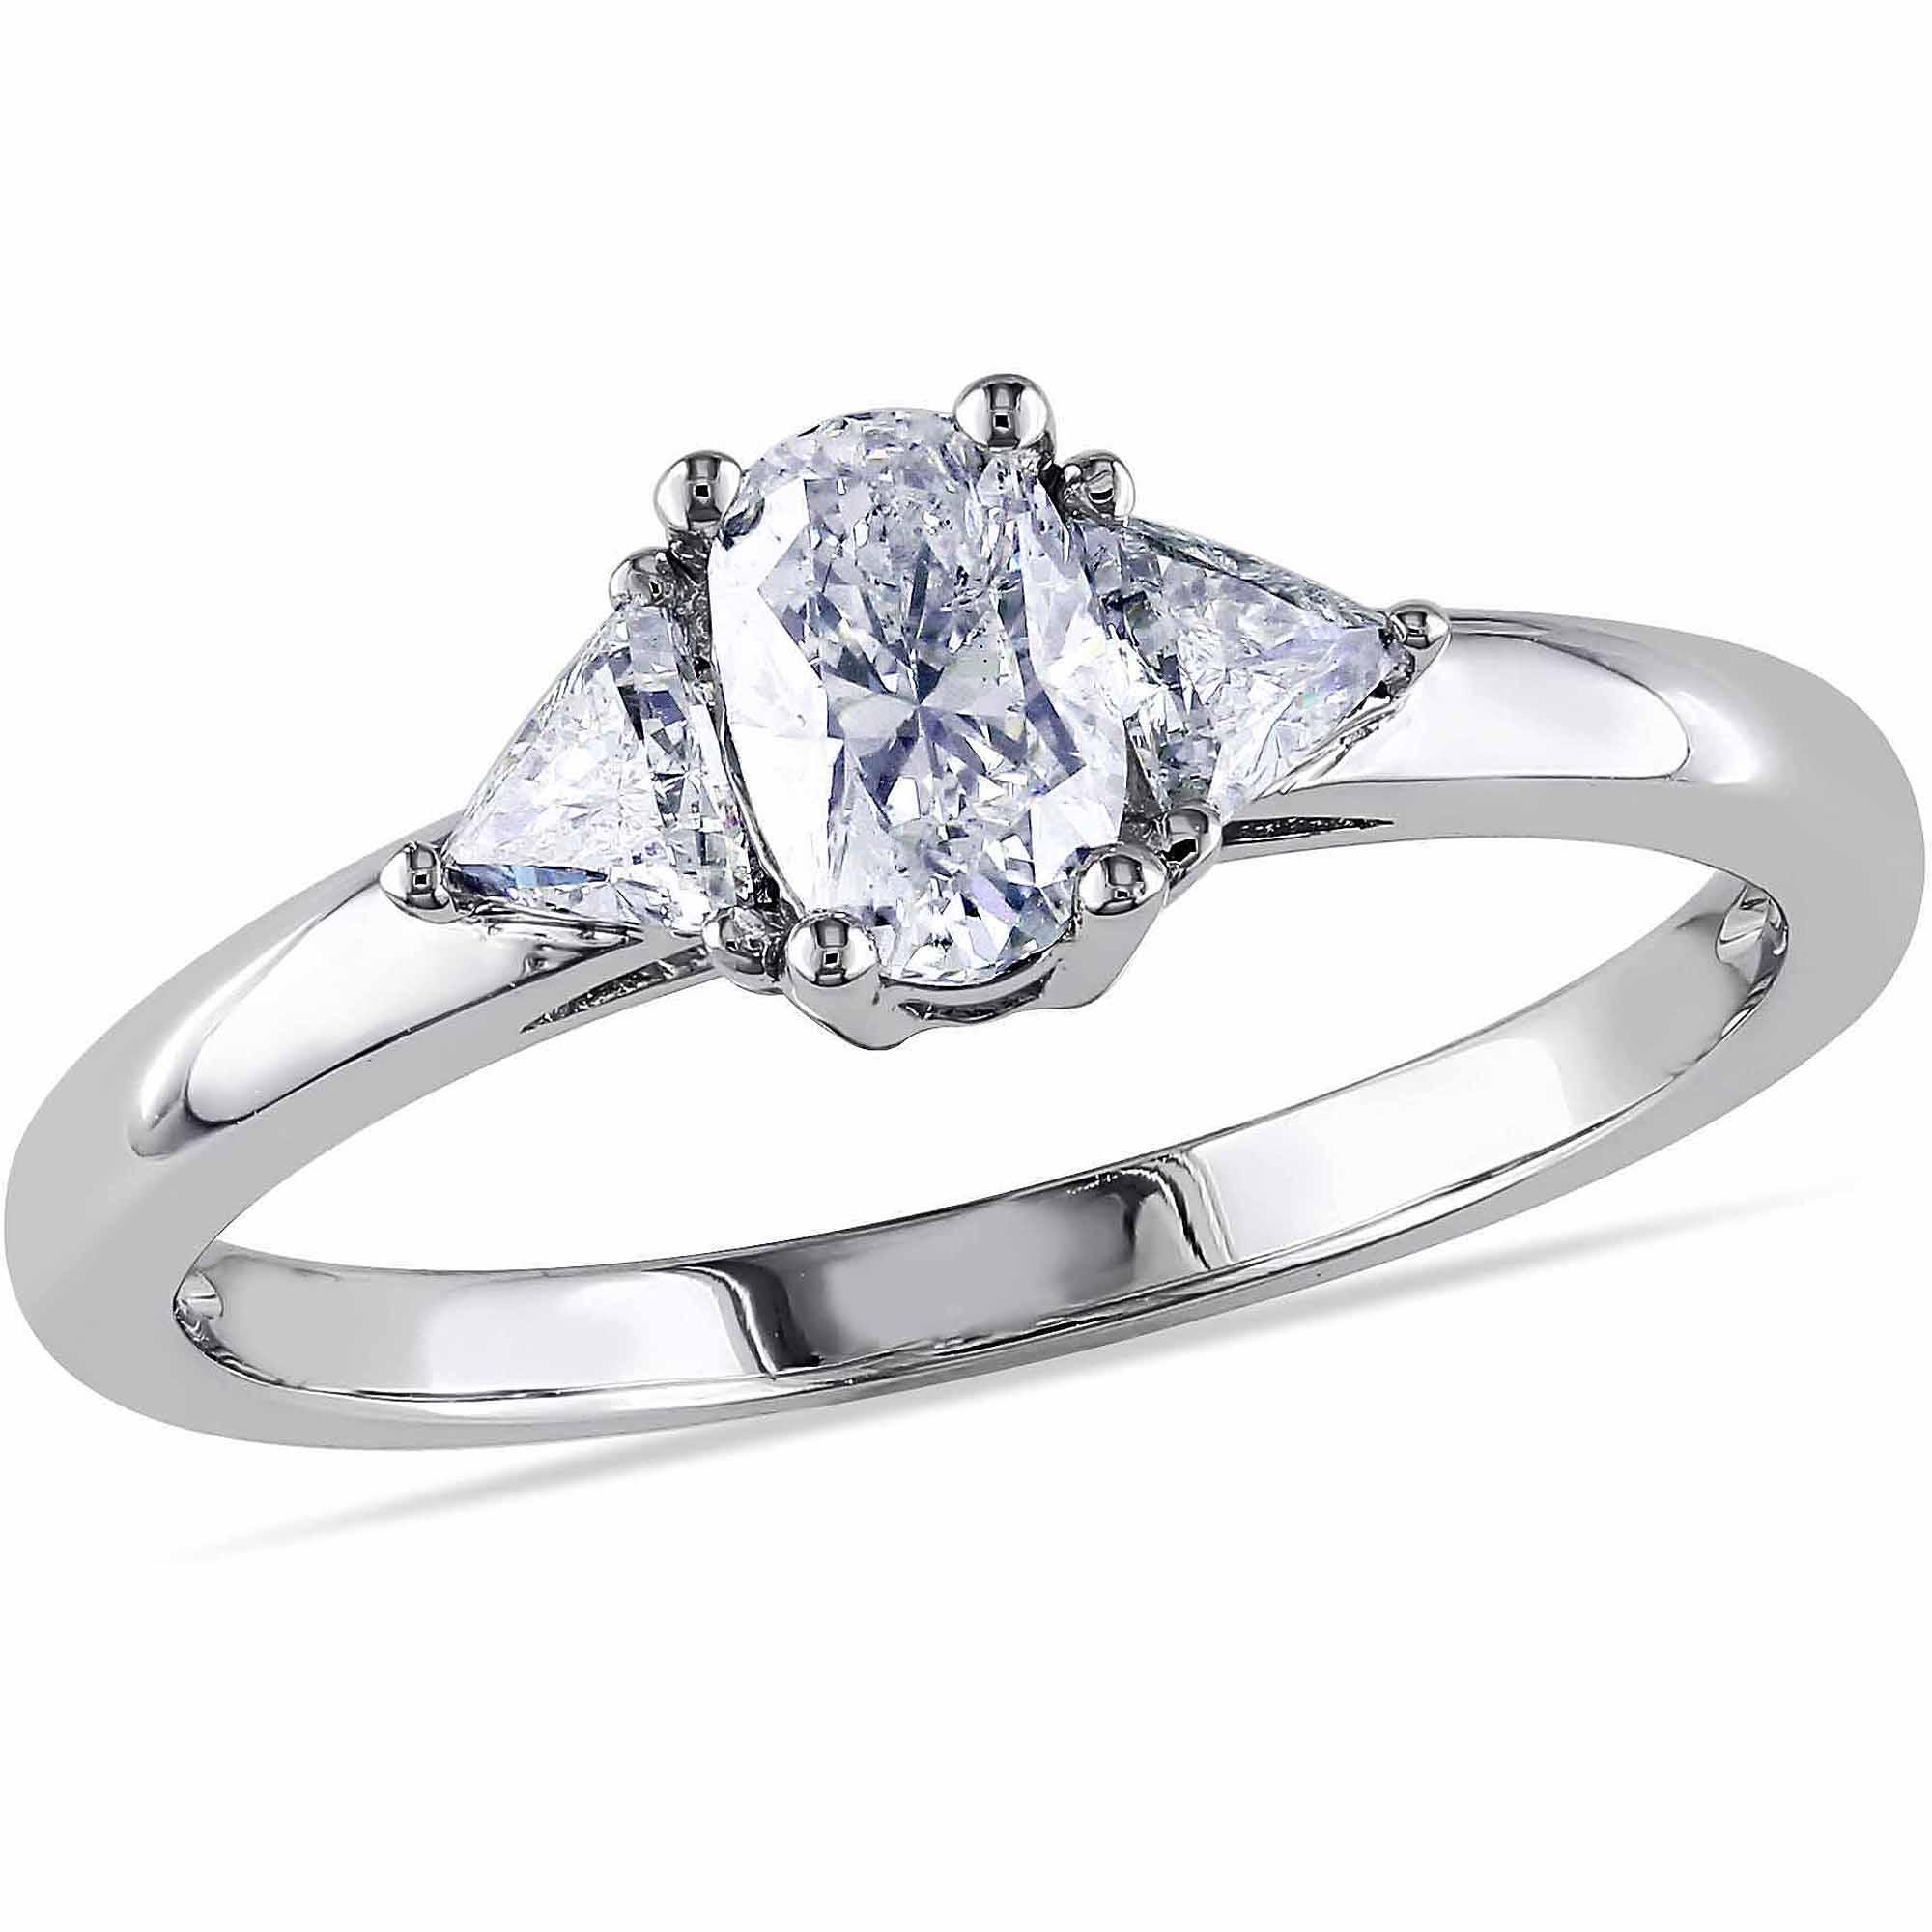 Value Of 1 4 Carat Diamond Ring